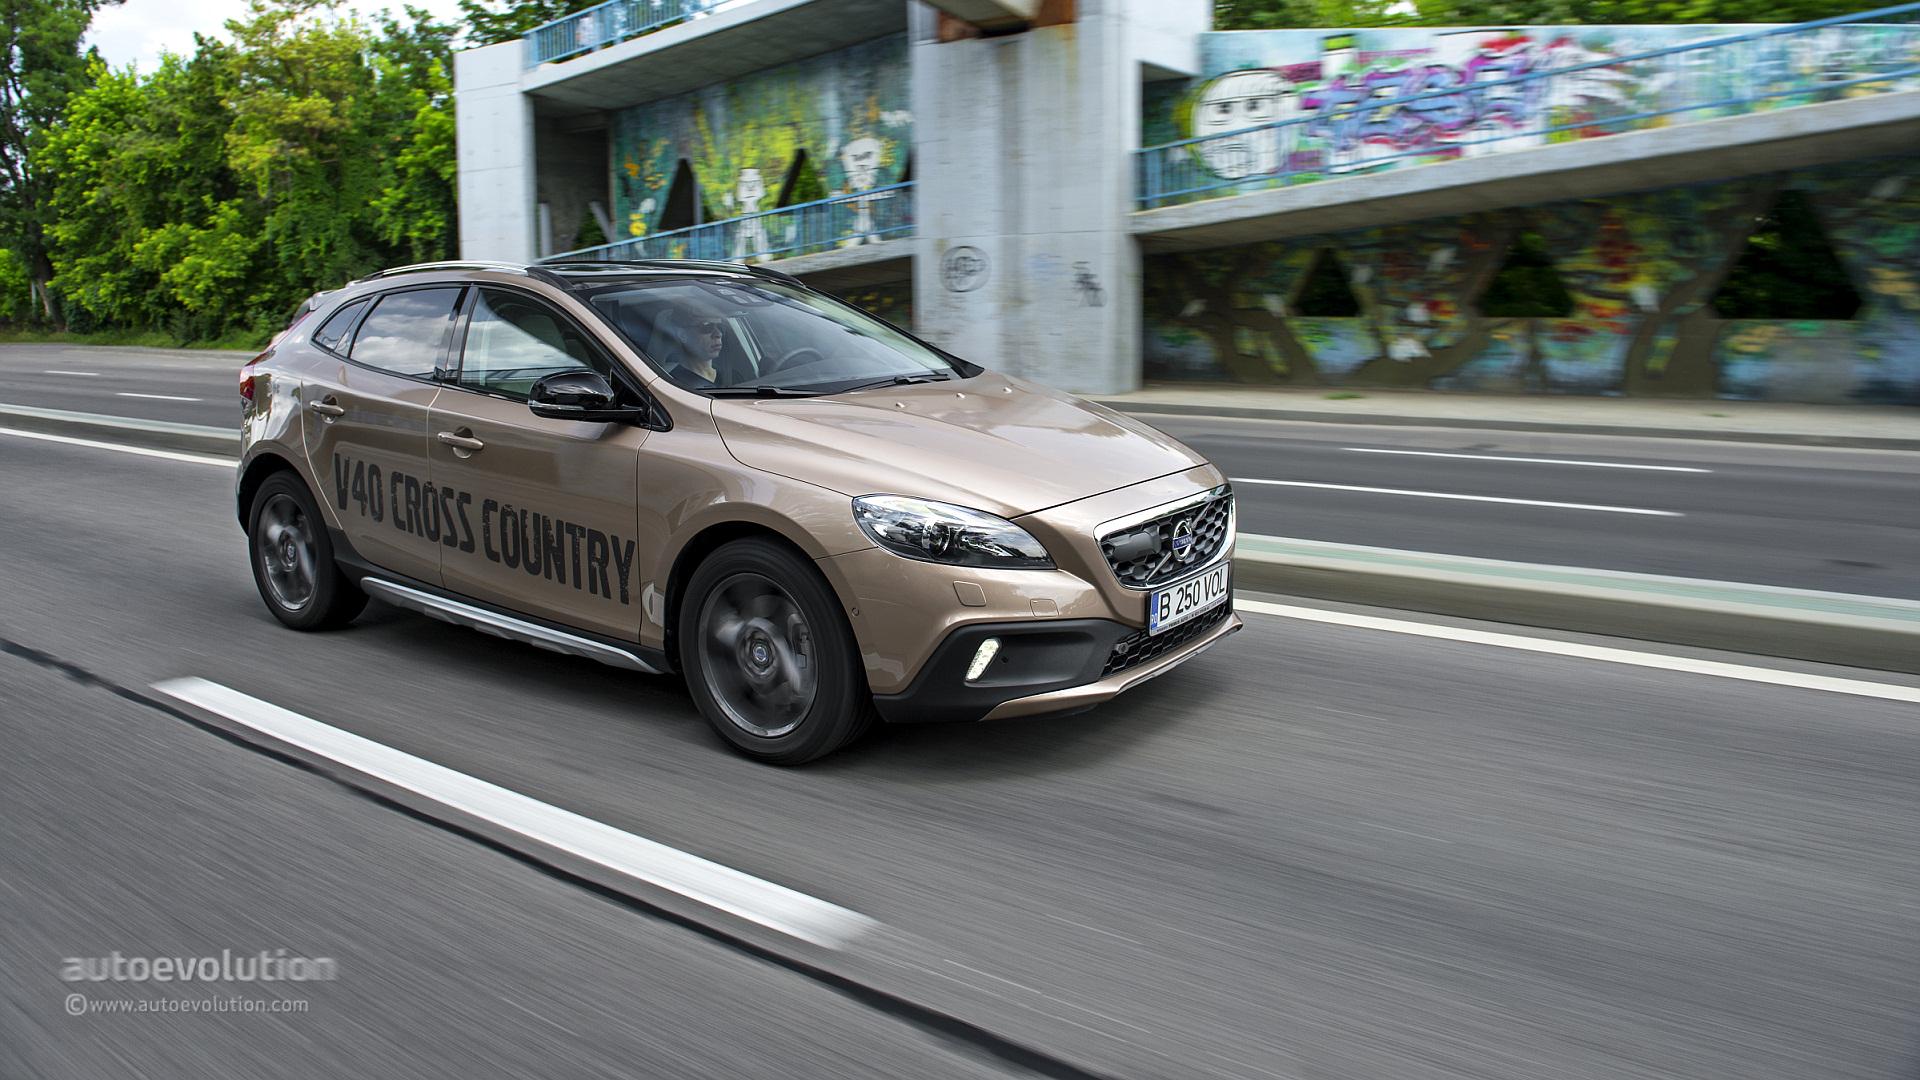 VOLVO V40 Cross Country Review (Technical Data) - autoevolution